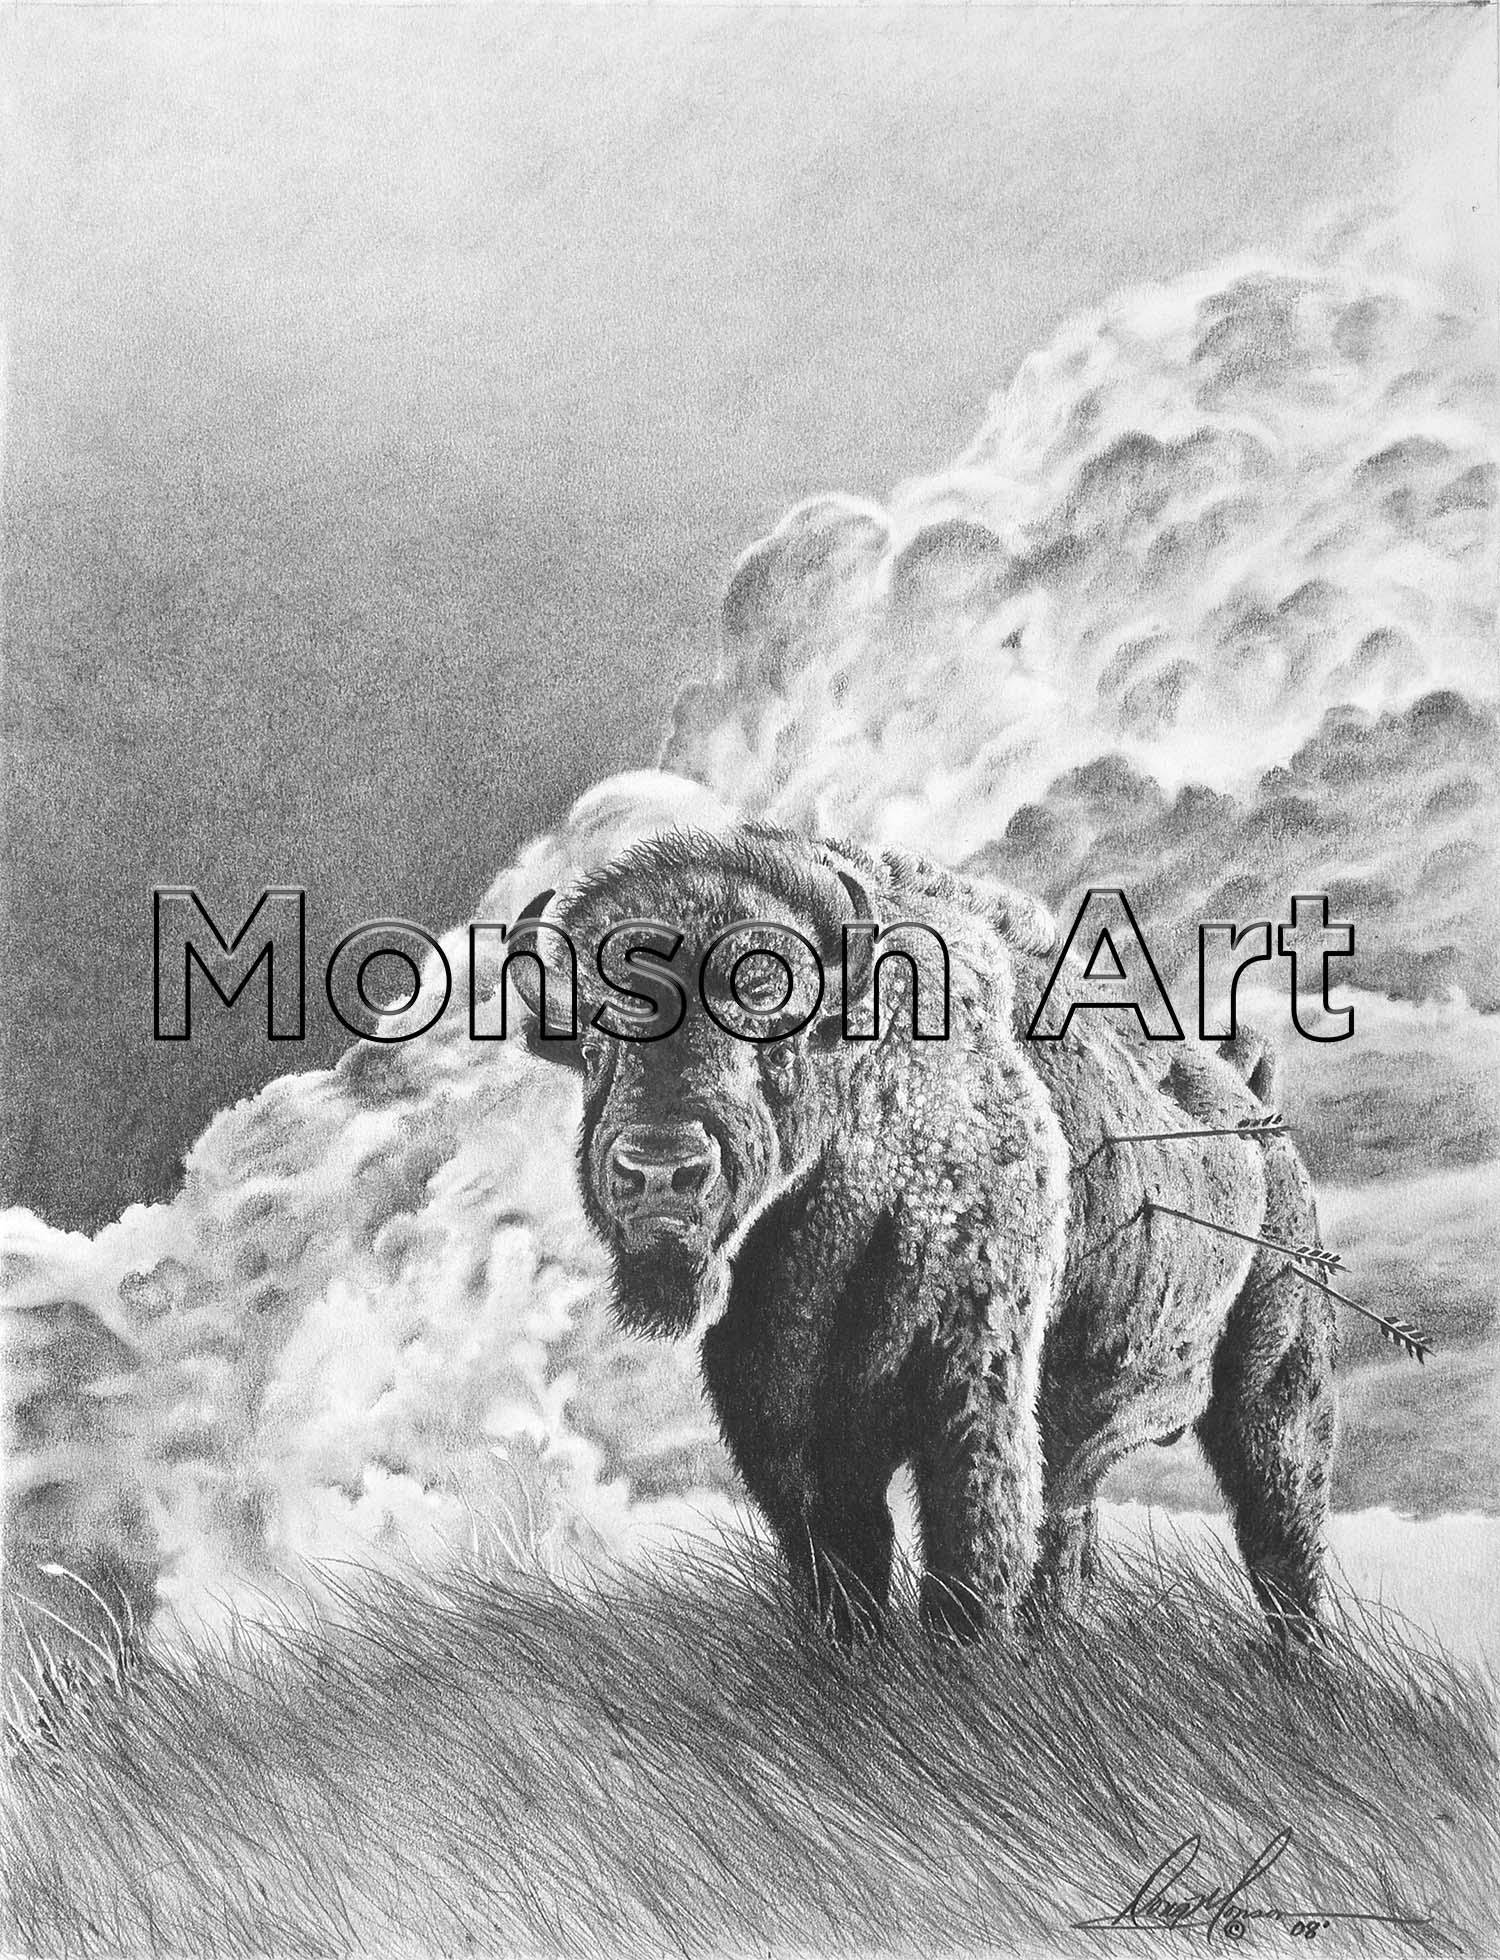 Monson080926-05